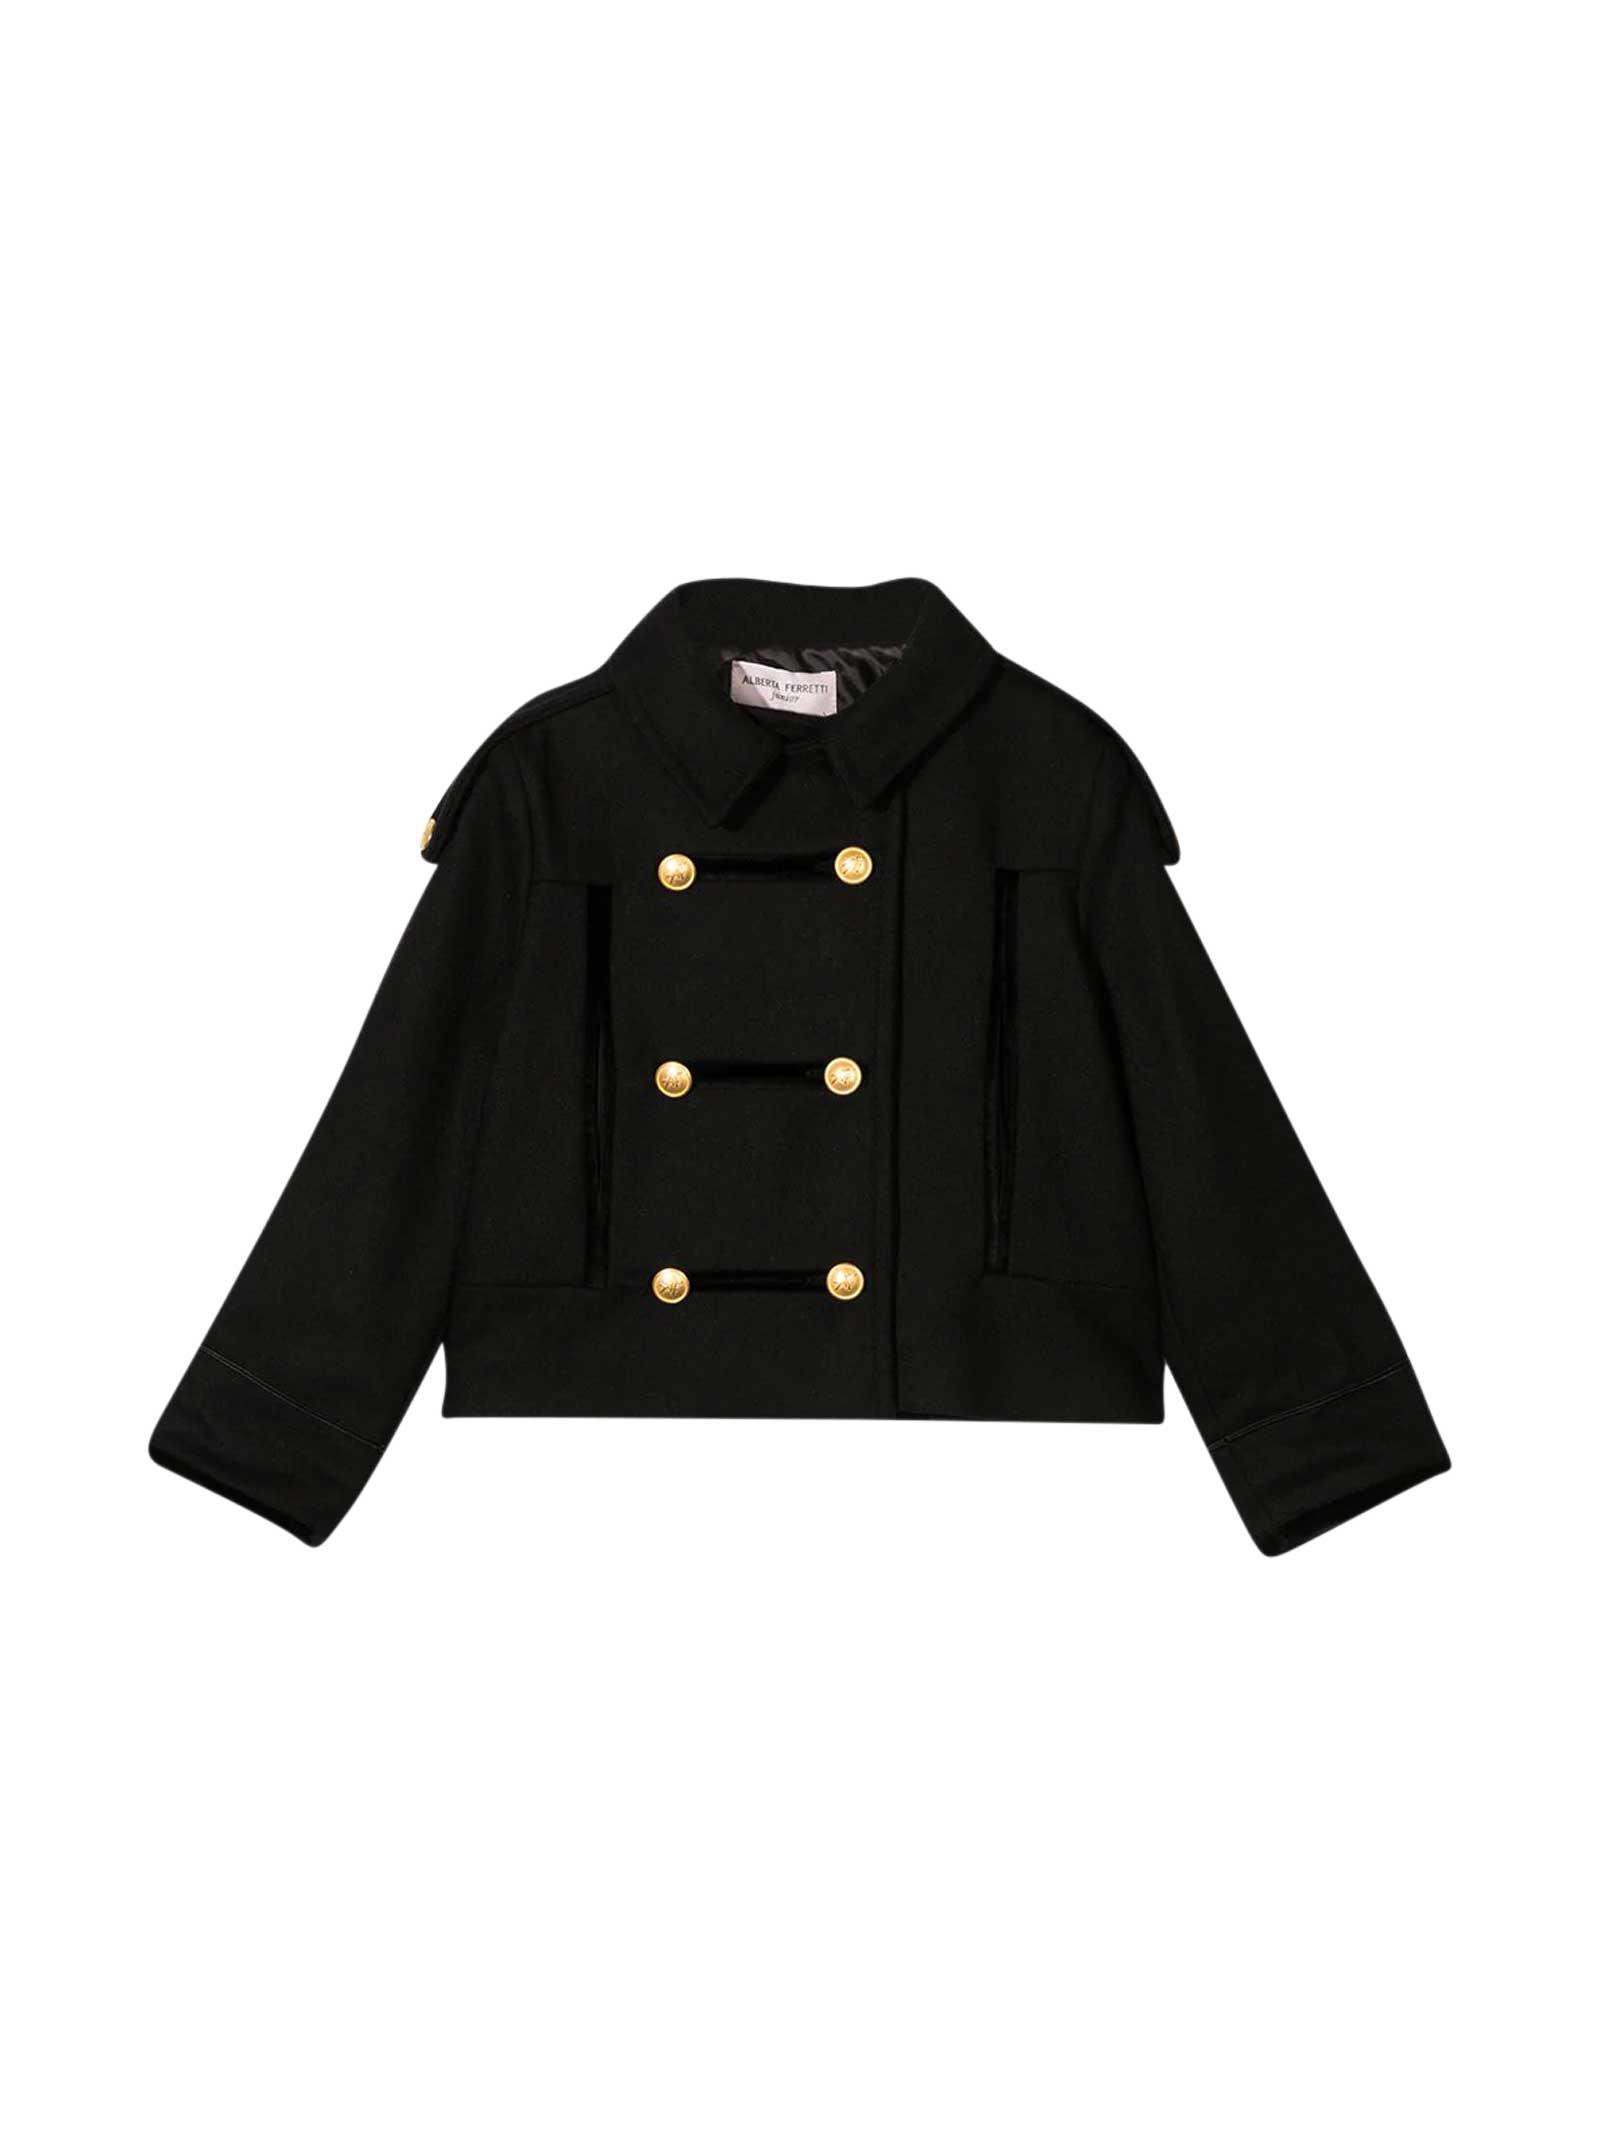 Alberta Ferretti Black Military Coat